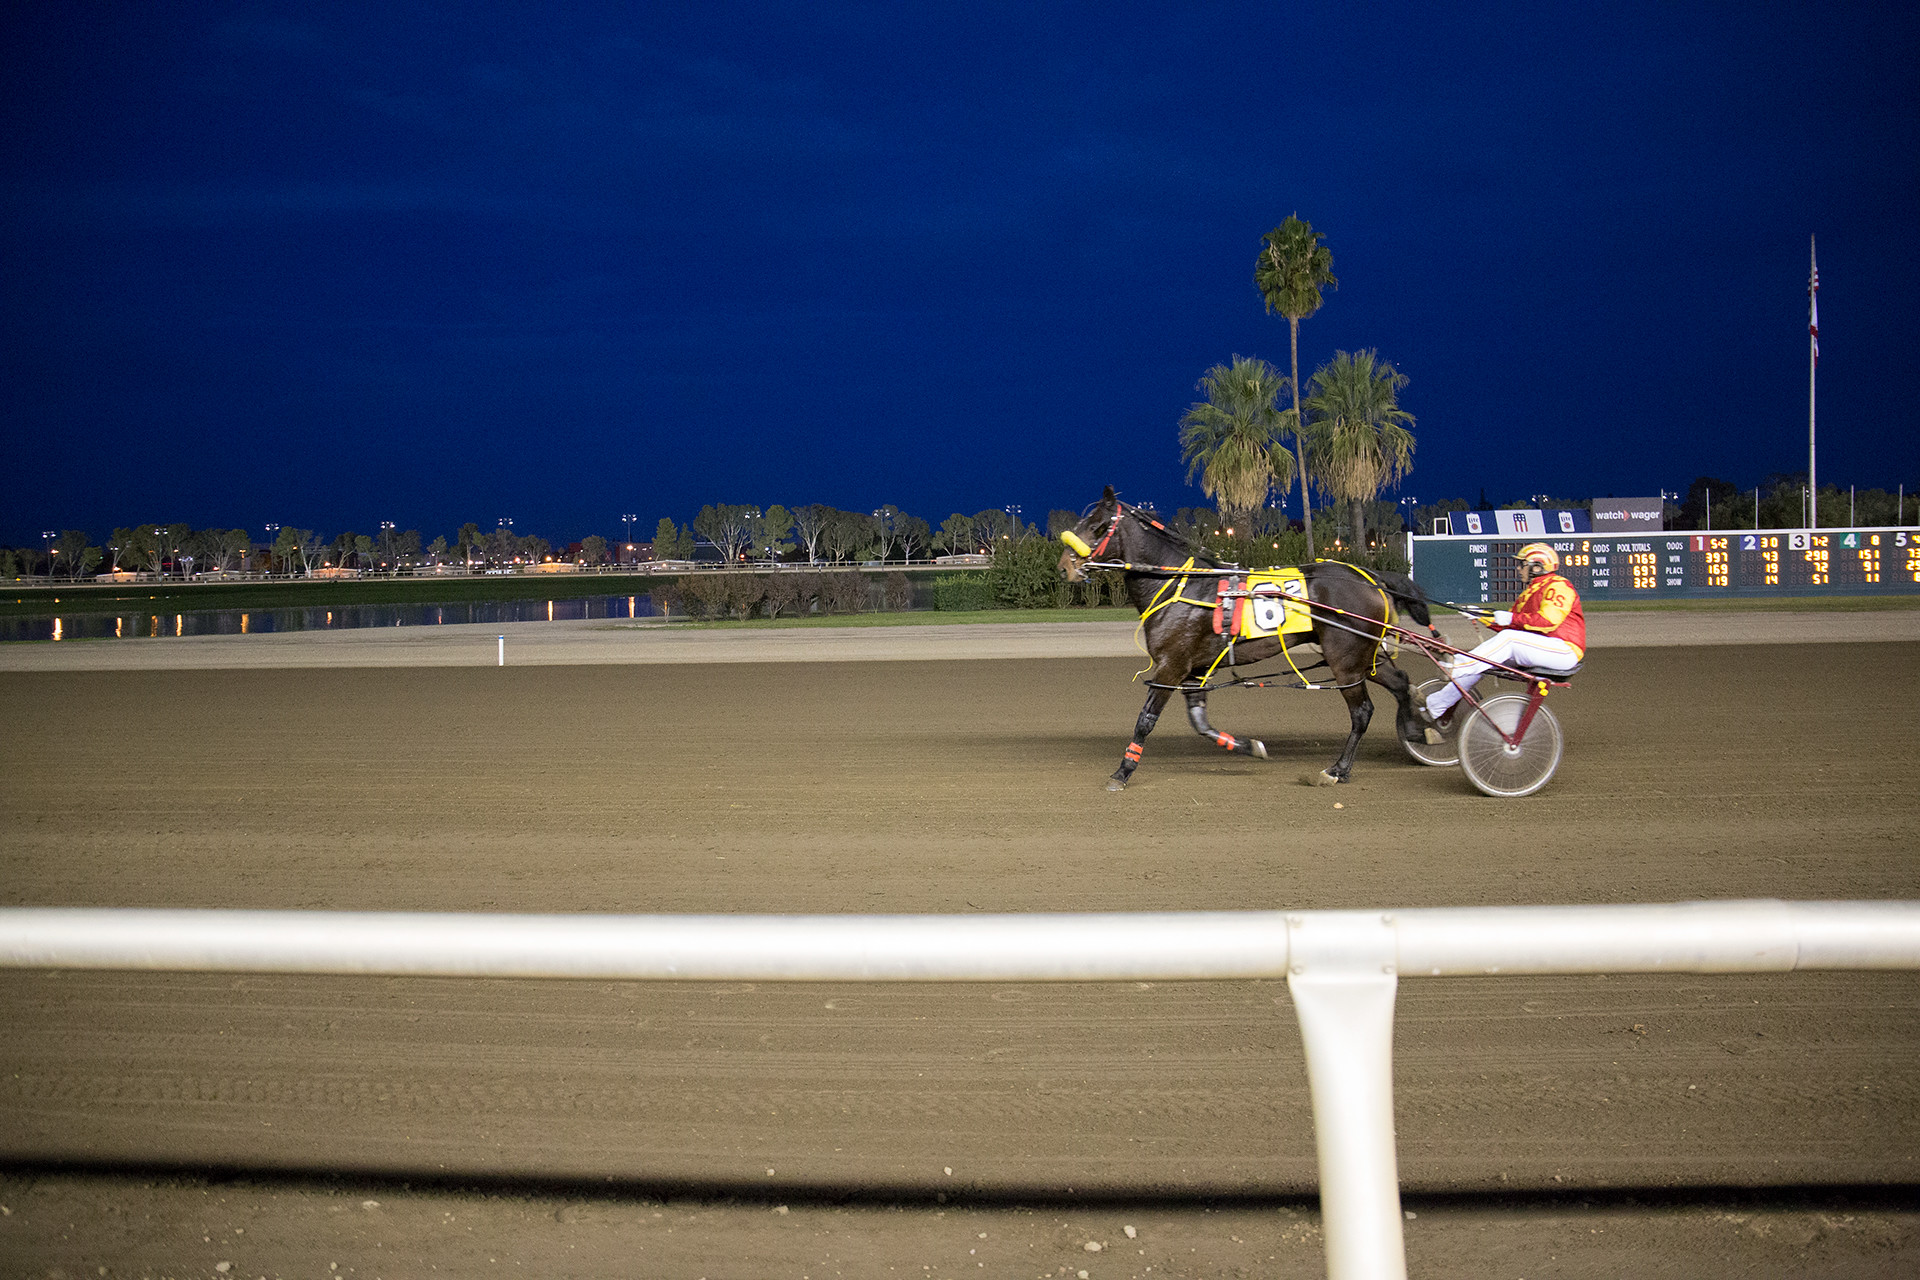 Night time harness racing. Single Racer